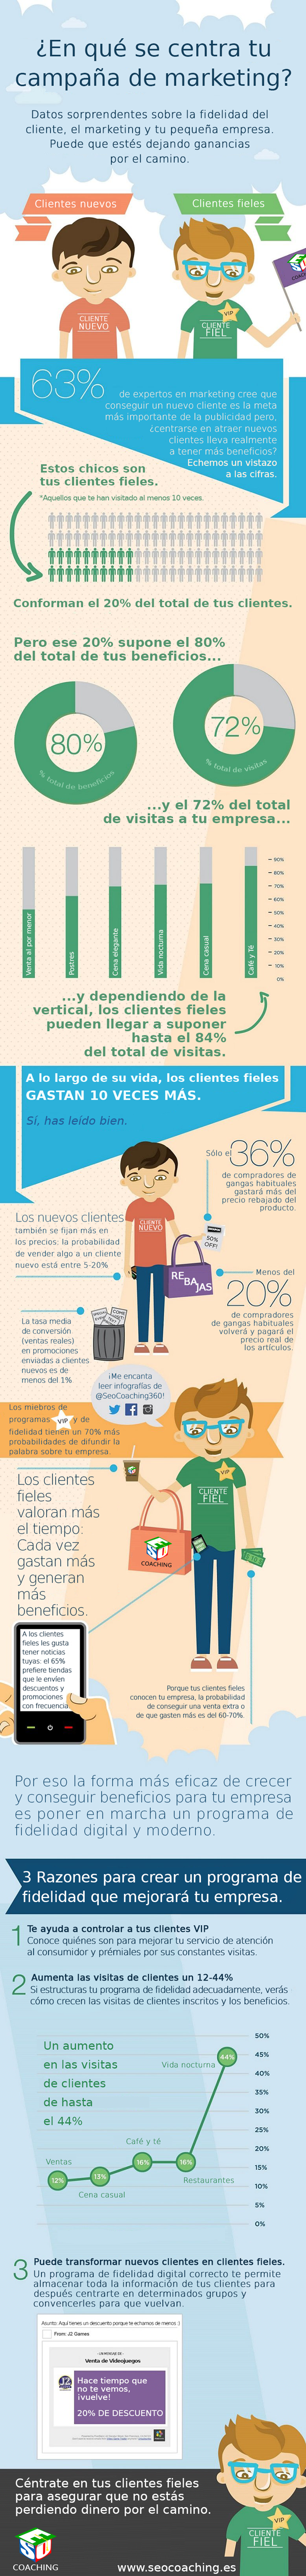 Marketing - En qué se centra tu campaña de marketing #infografia #infographic